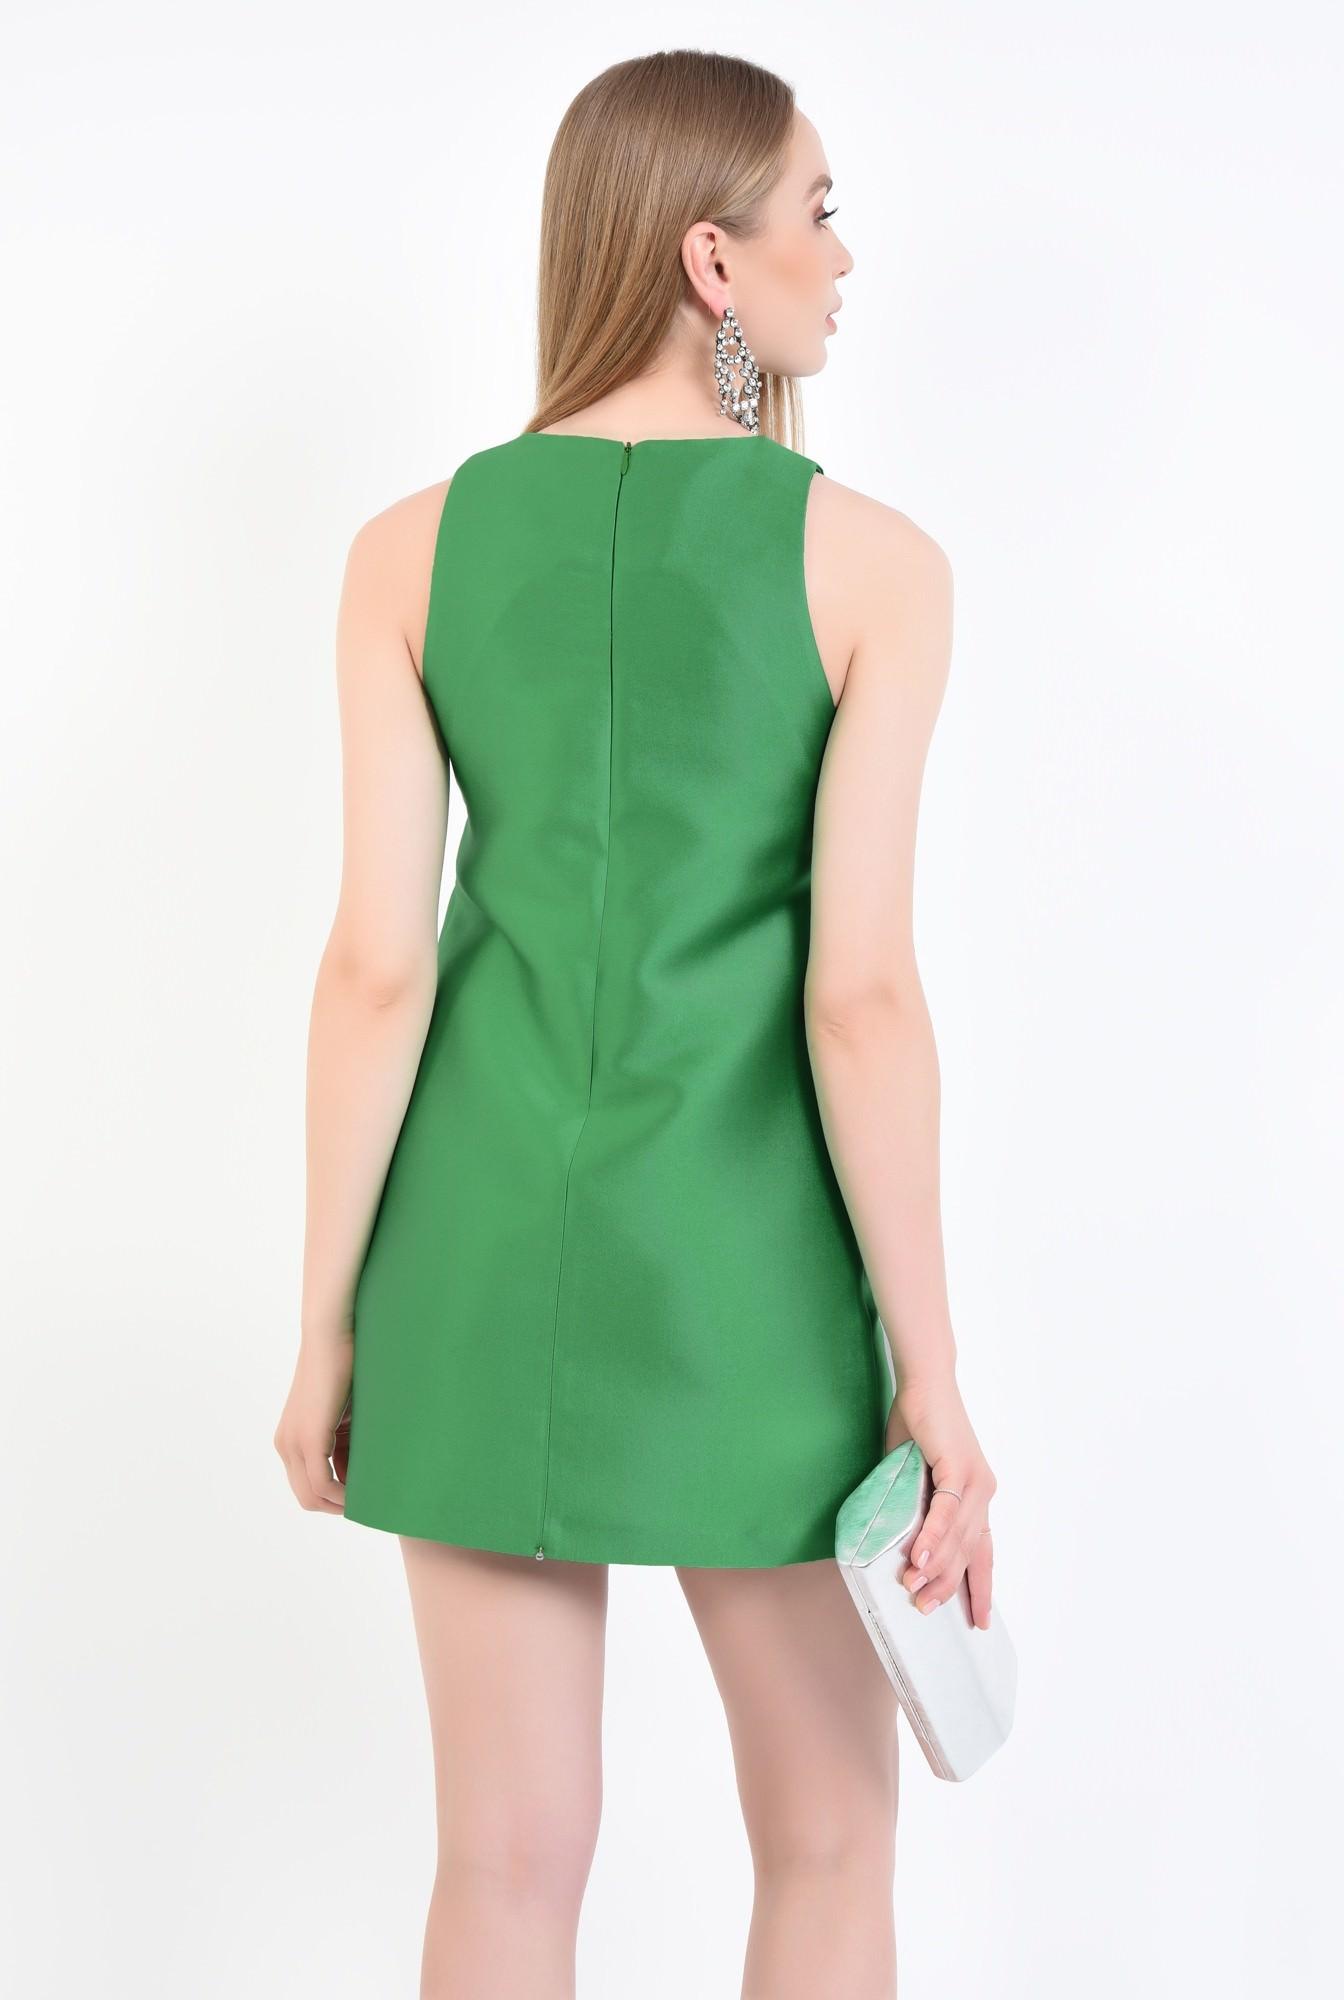 1 - 360 - rochie de seara, lejera, fara betelie, rochie din tafta